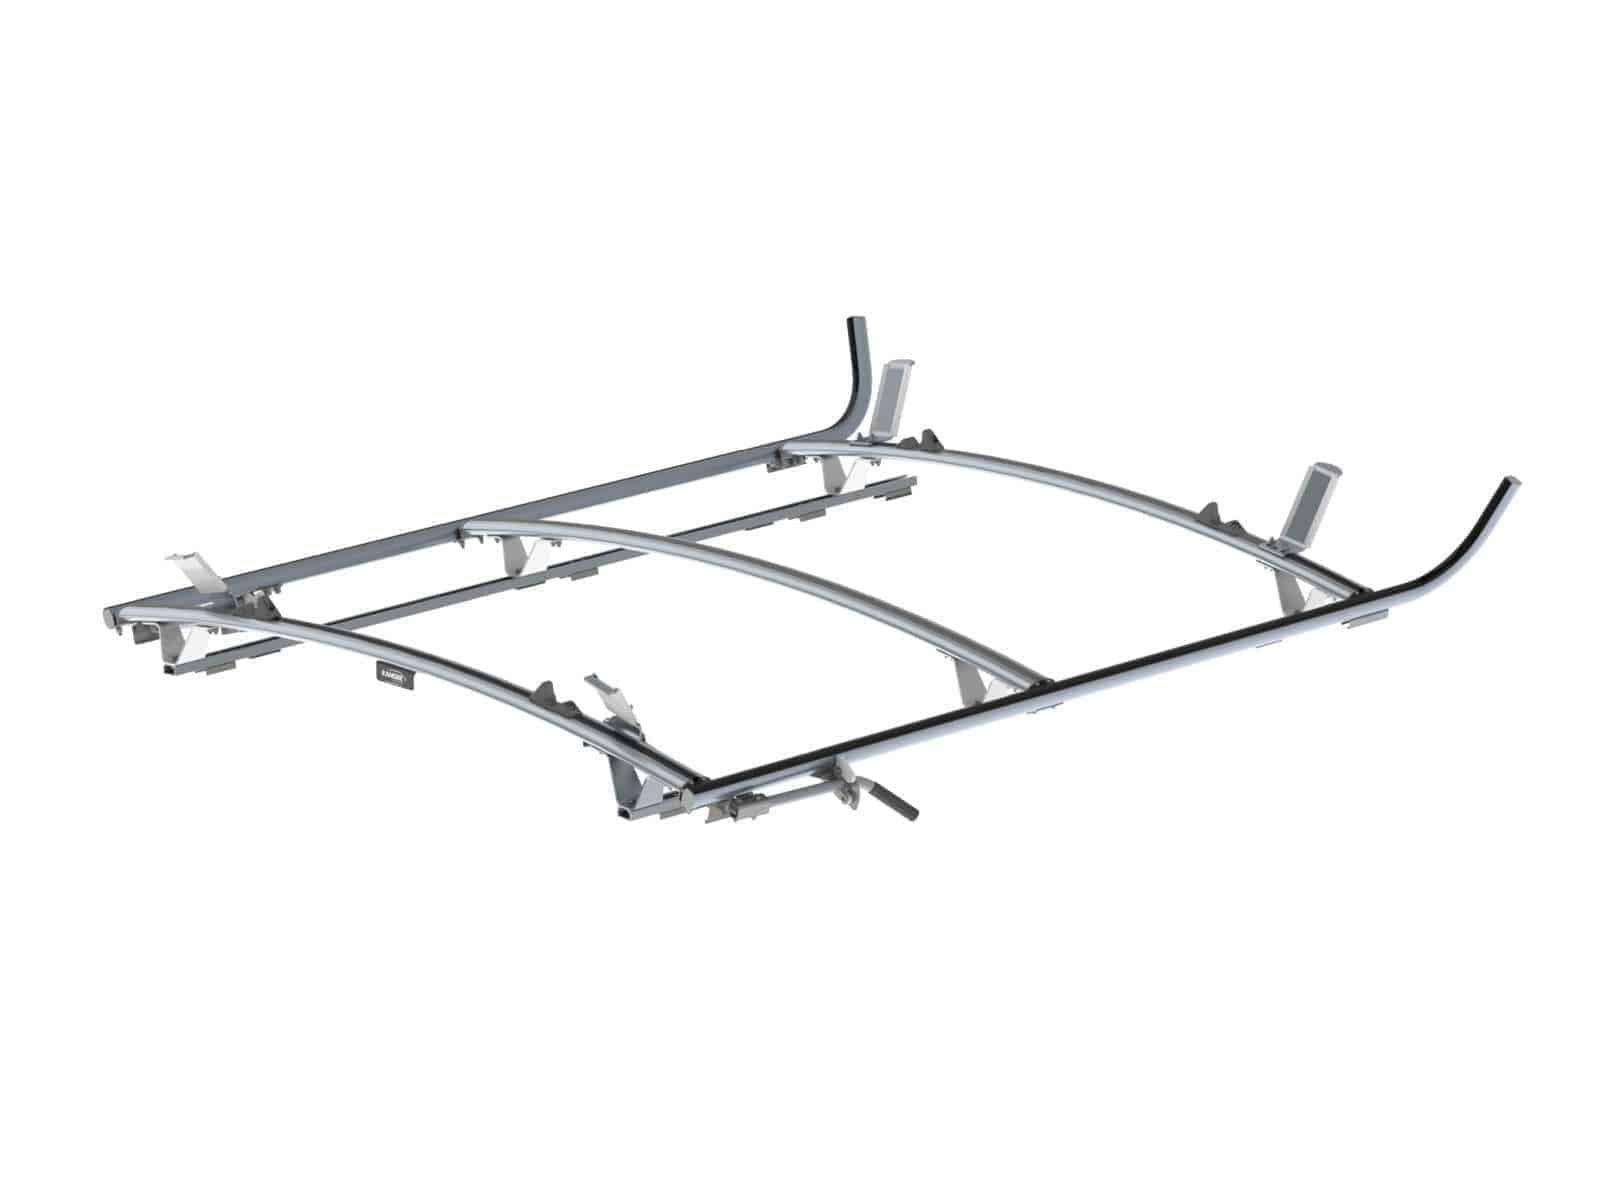 Double Side Ram Promaster Ladder Rack 3 Bar System